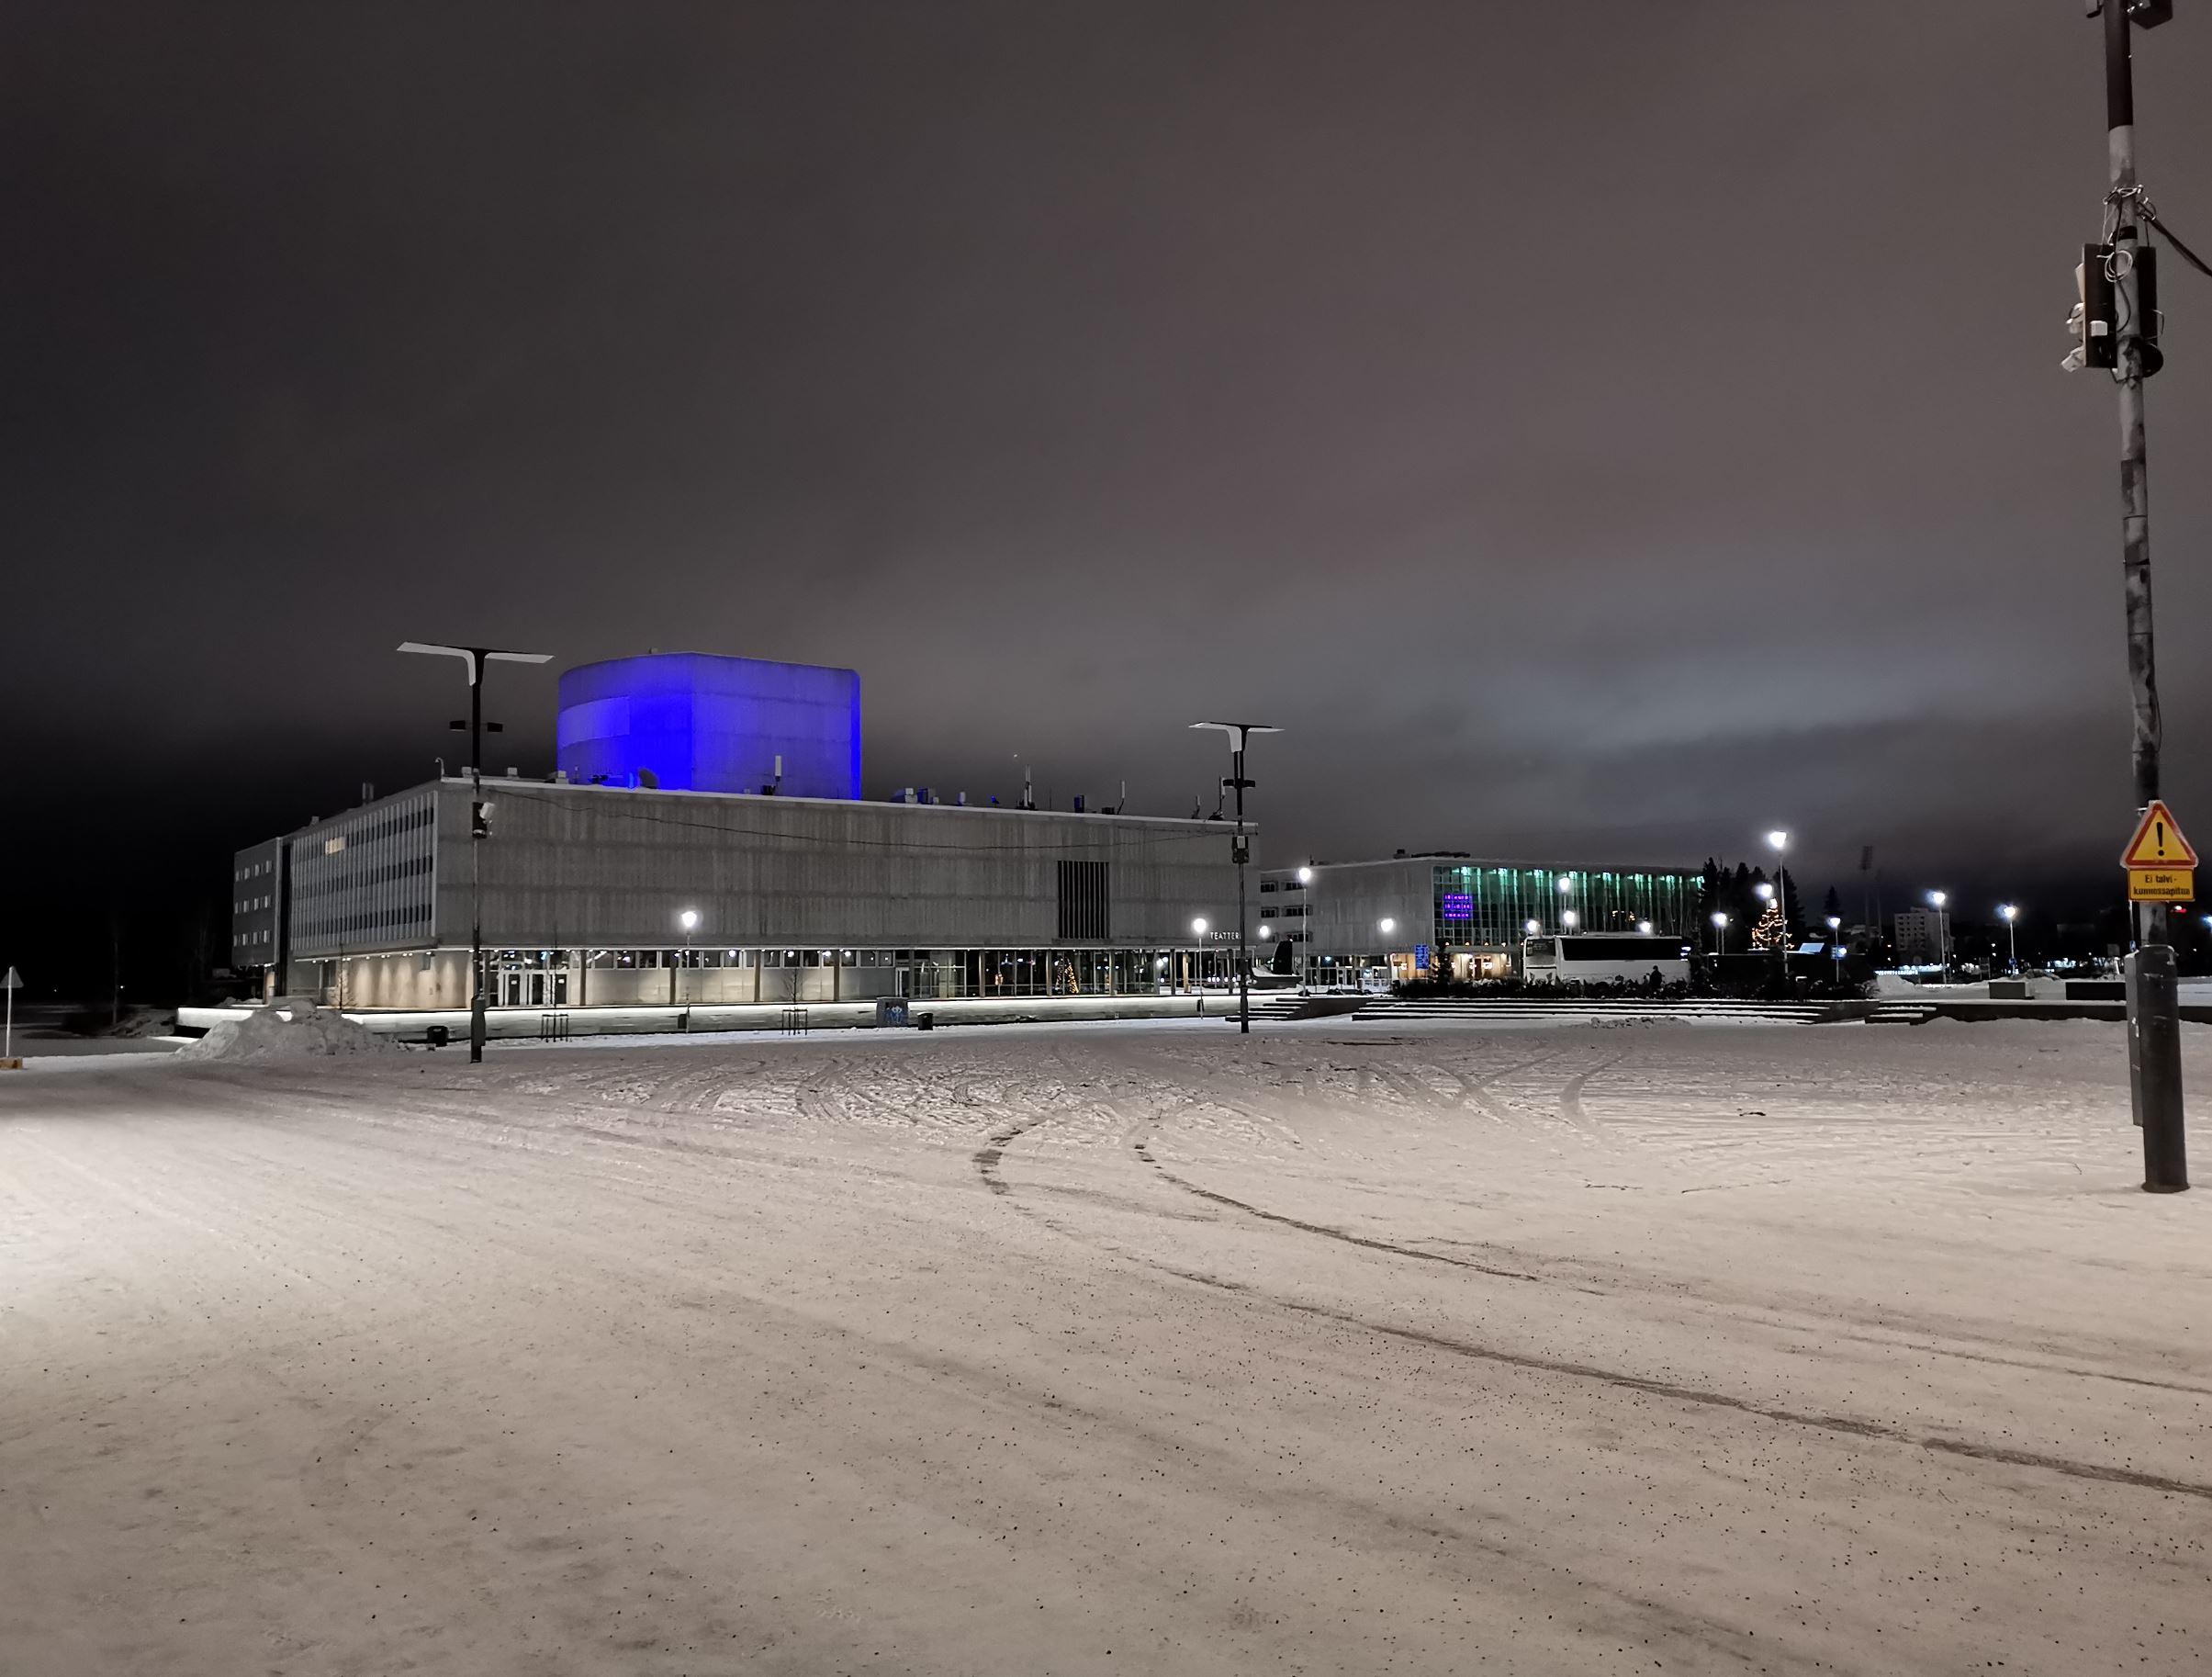 Elisa_5G_Oulu_Torinranta_photo.JPG